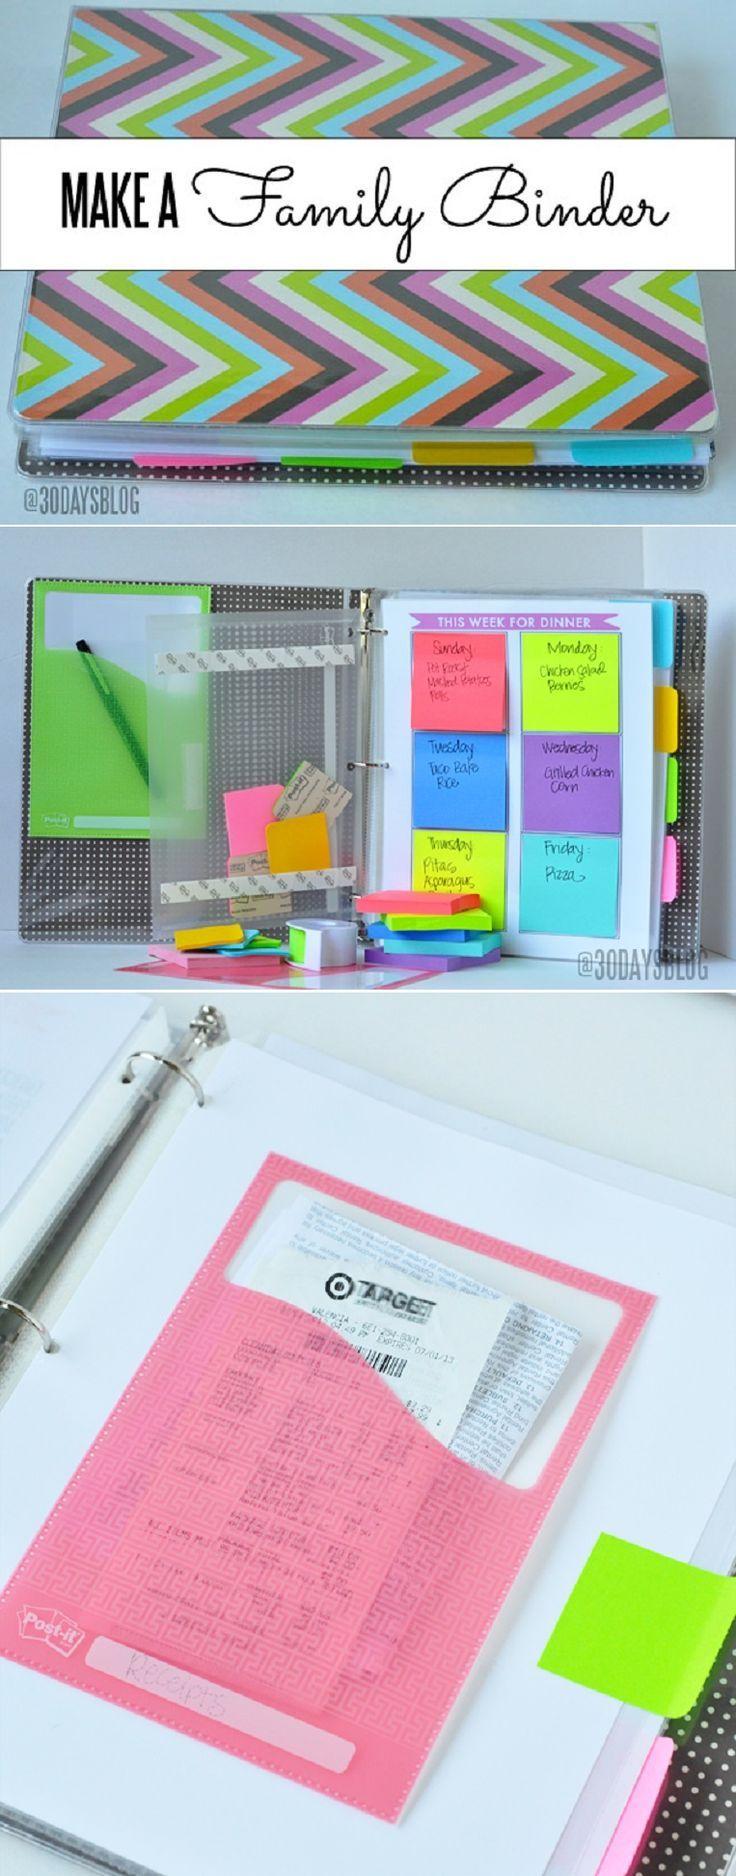 Family Binder - 12 DIY Binder Organization Projects | Keep the whole family organized with these ideas. | www.thirtyhadmadedays.com